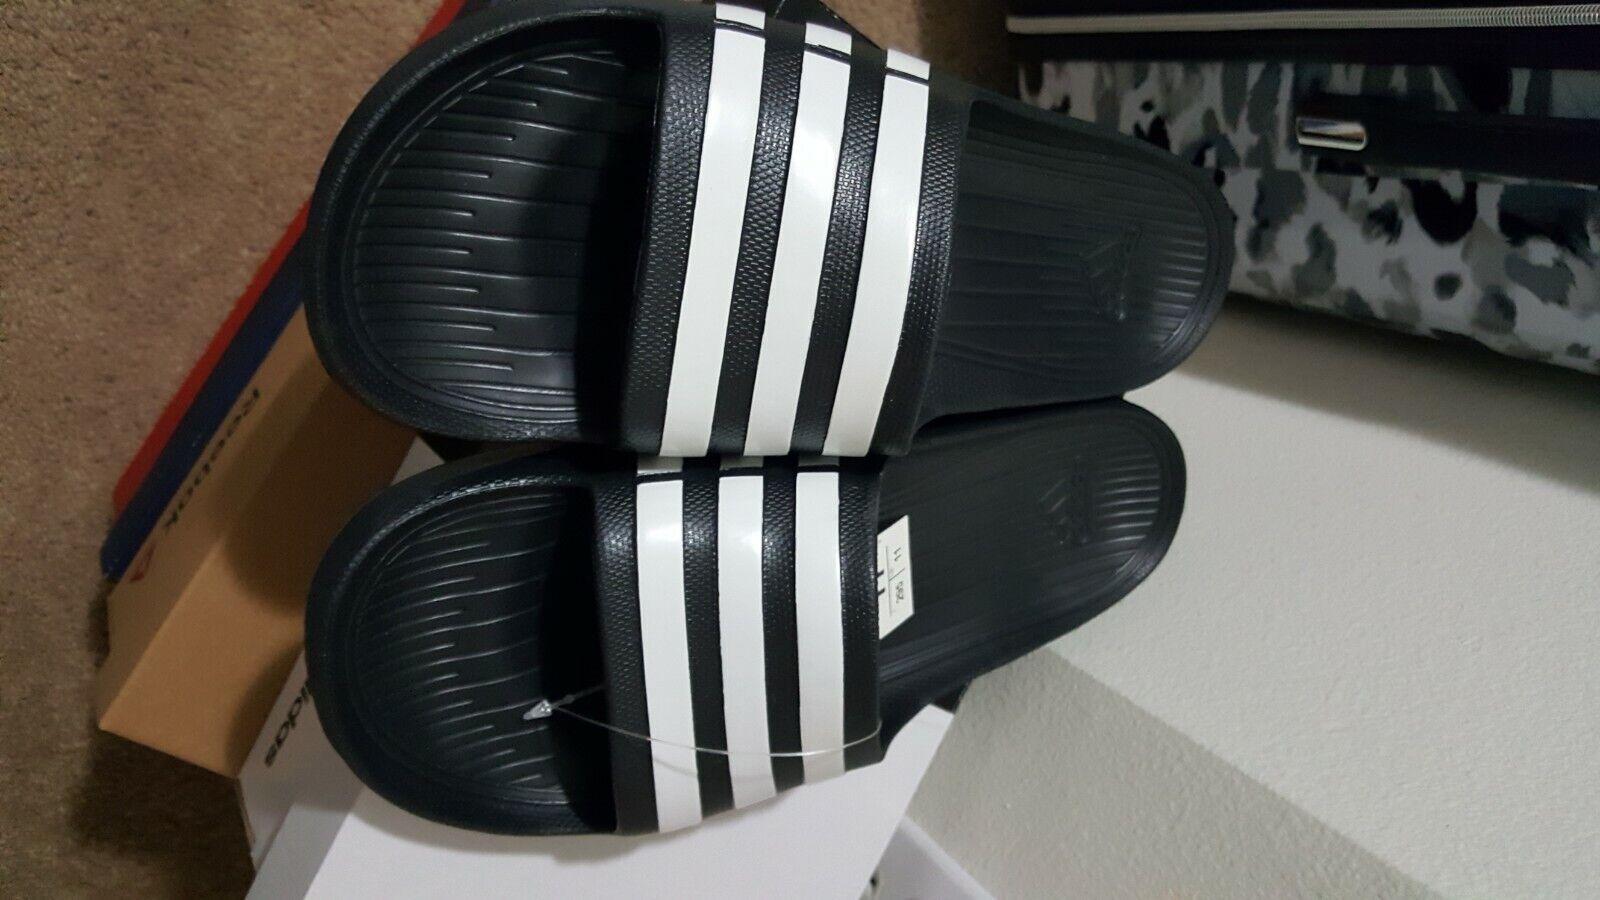 Adidas Mens Duramo Slide Size 11 Sandals Slippers Black NEW!